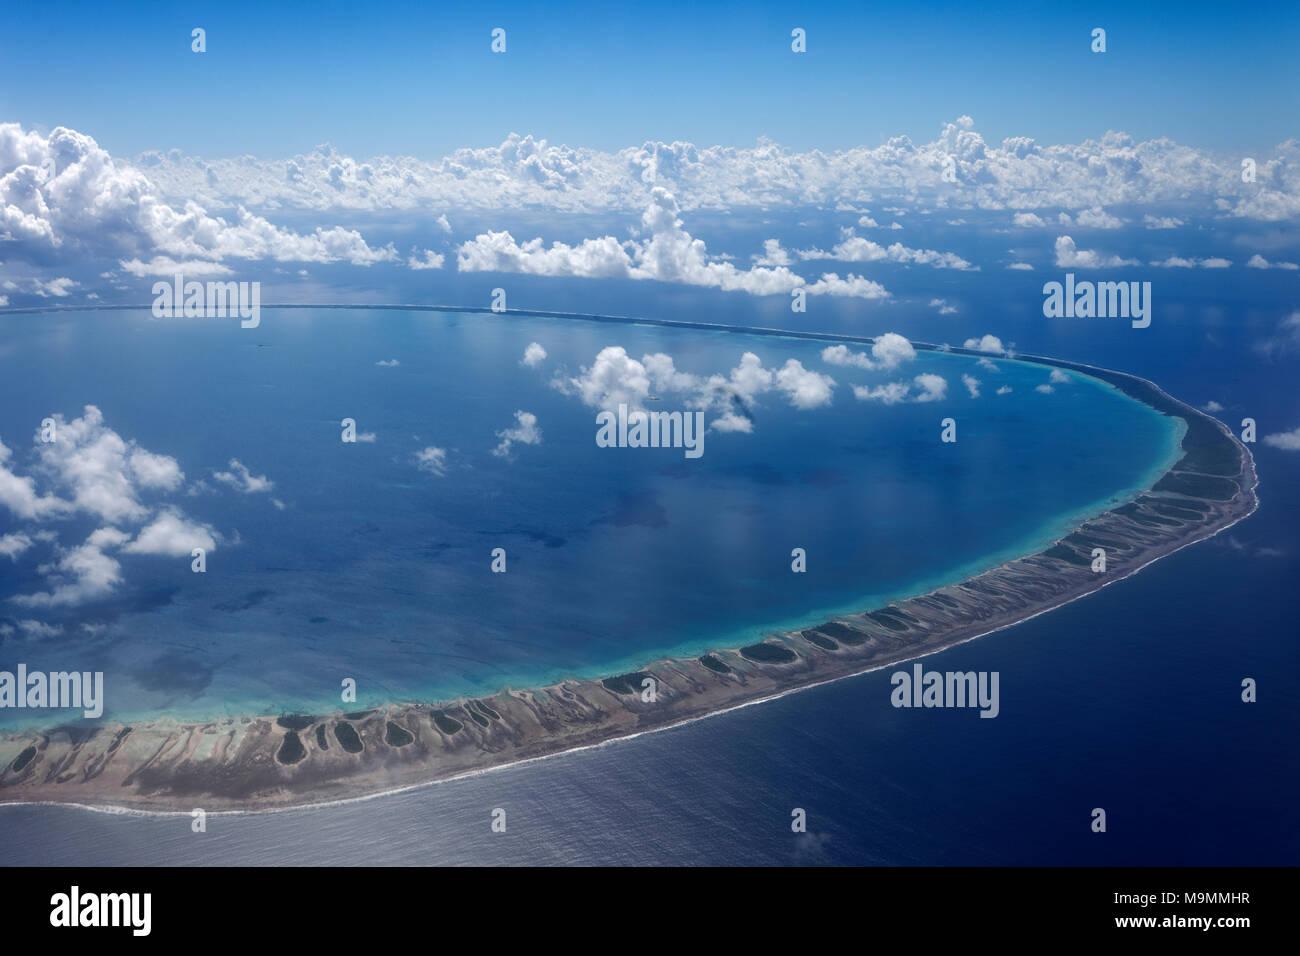 Luftbild, Ringatoll, Rangiroa, Gesellschaftsinseln, Windward Islands, Französisch-Polynesien Stockbild